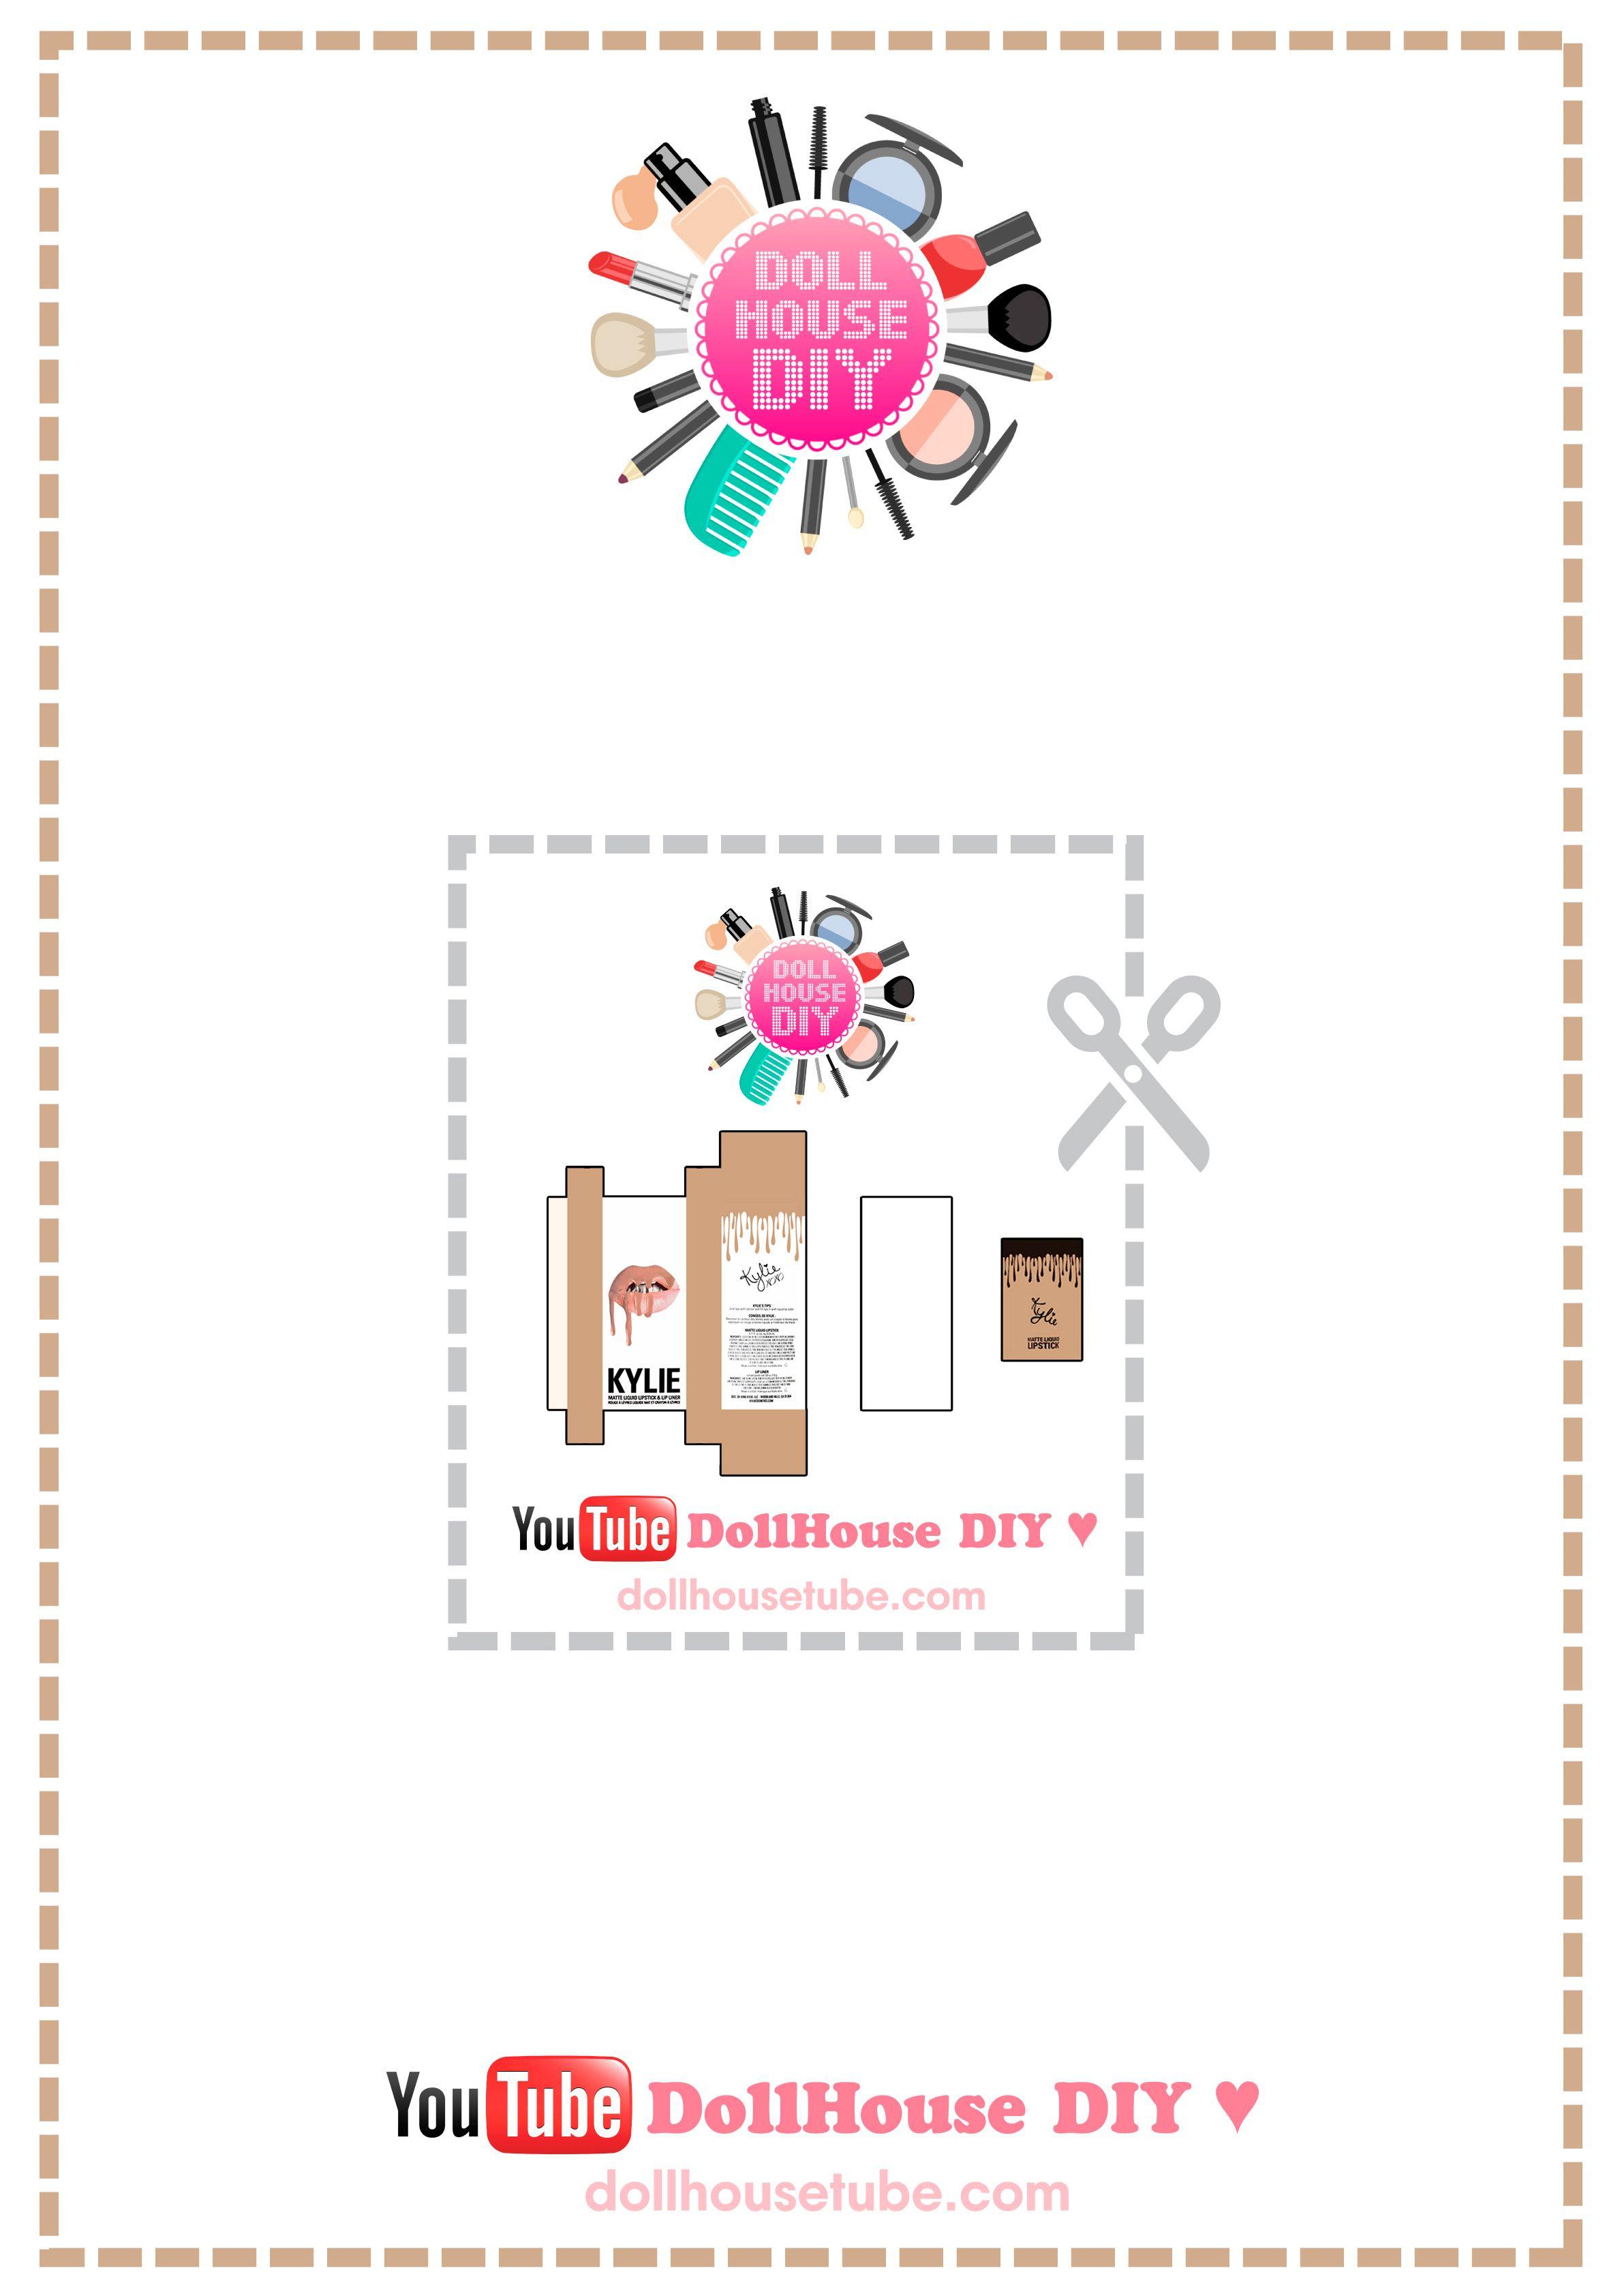 Realistic Miniature LIP KIT by Kylie Jenner Tutorial! DollHouse DIY ♥